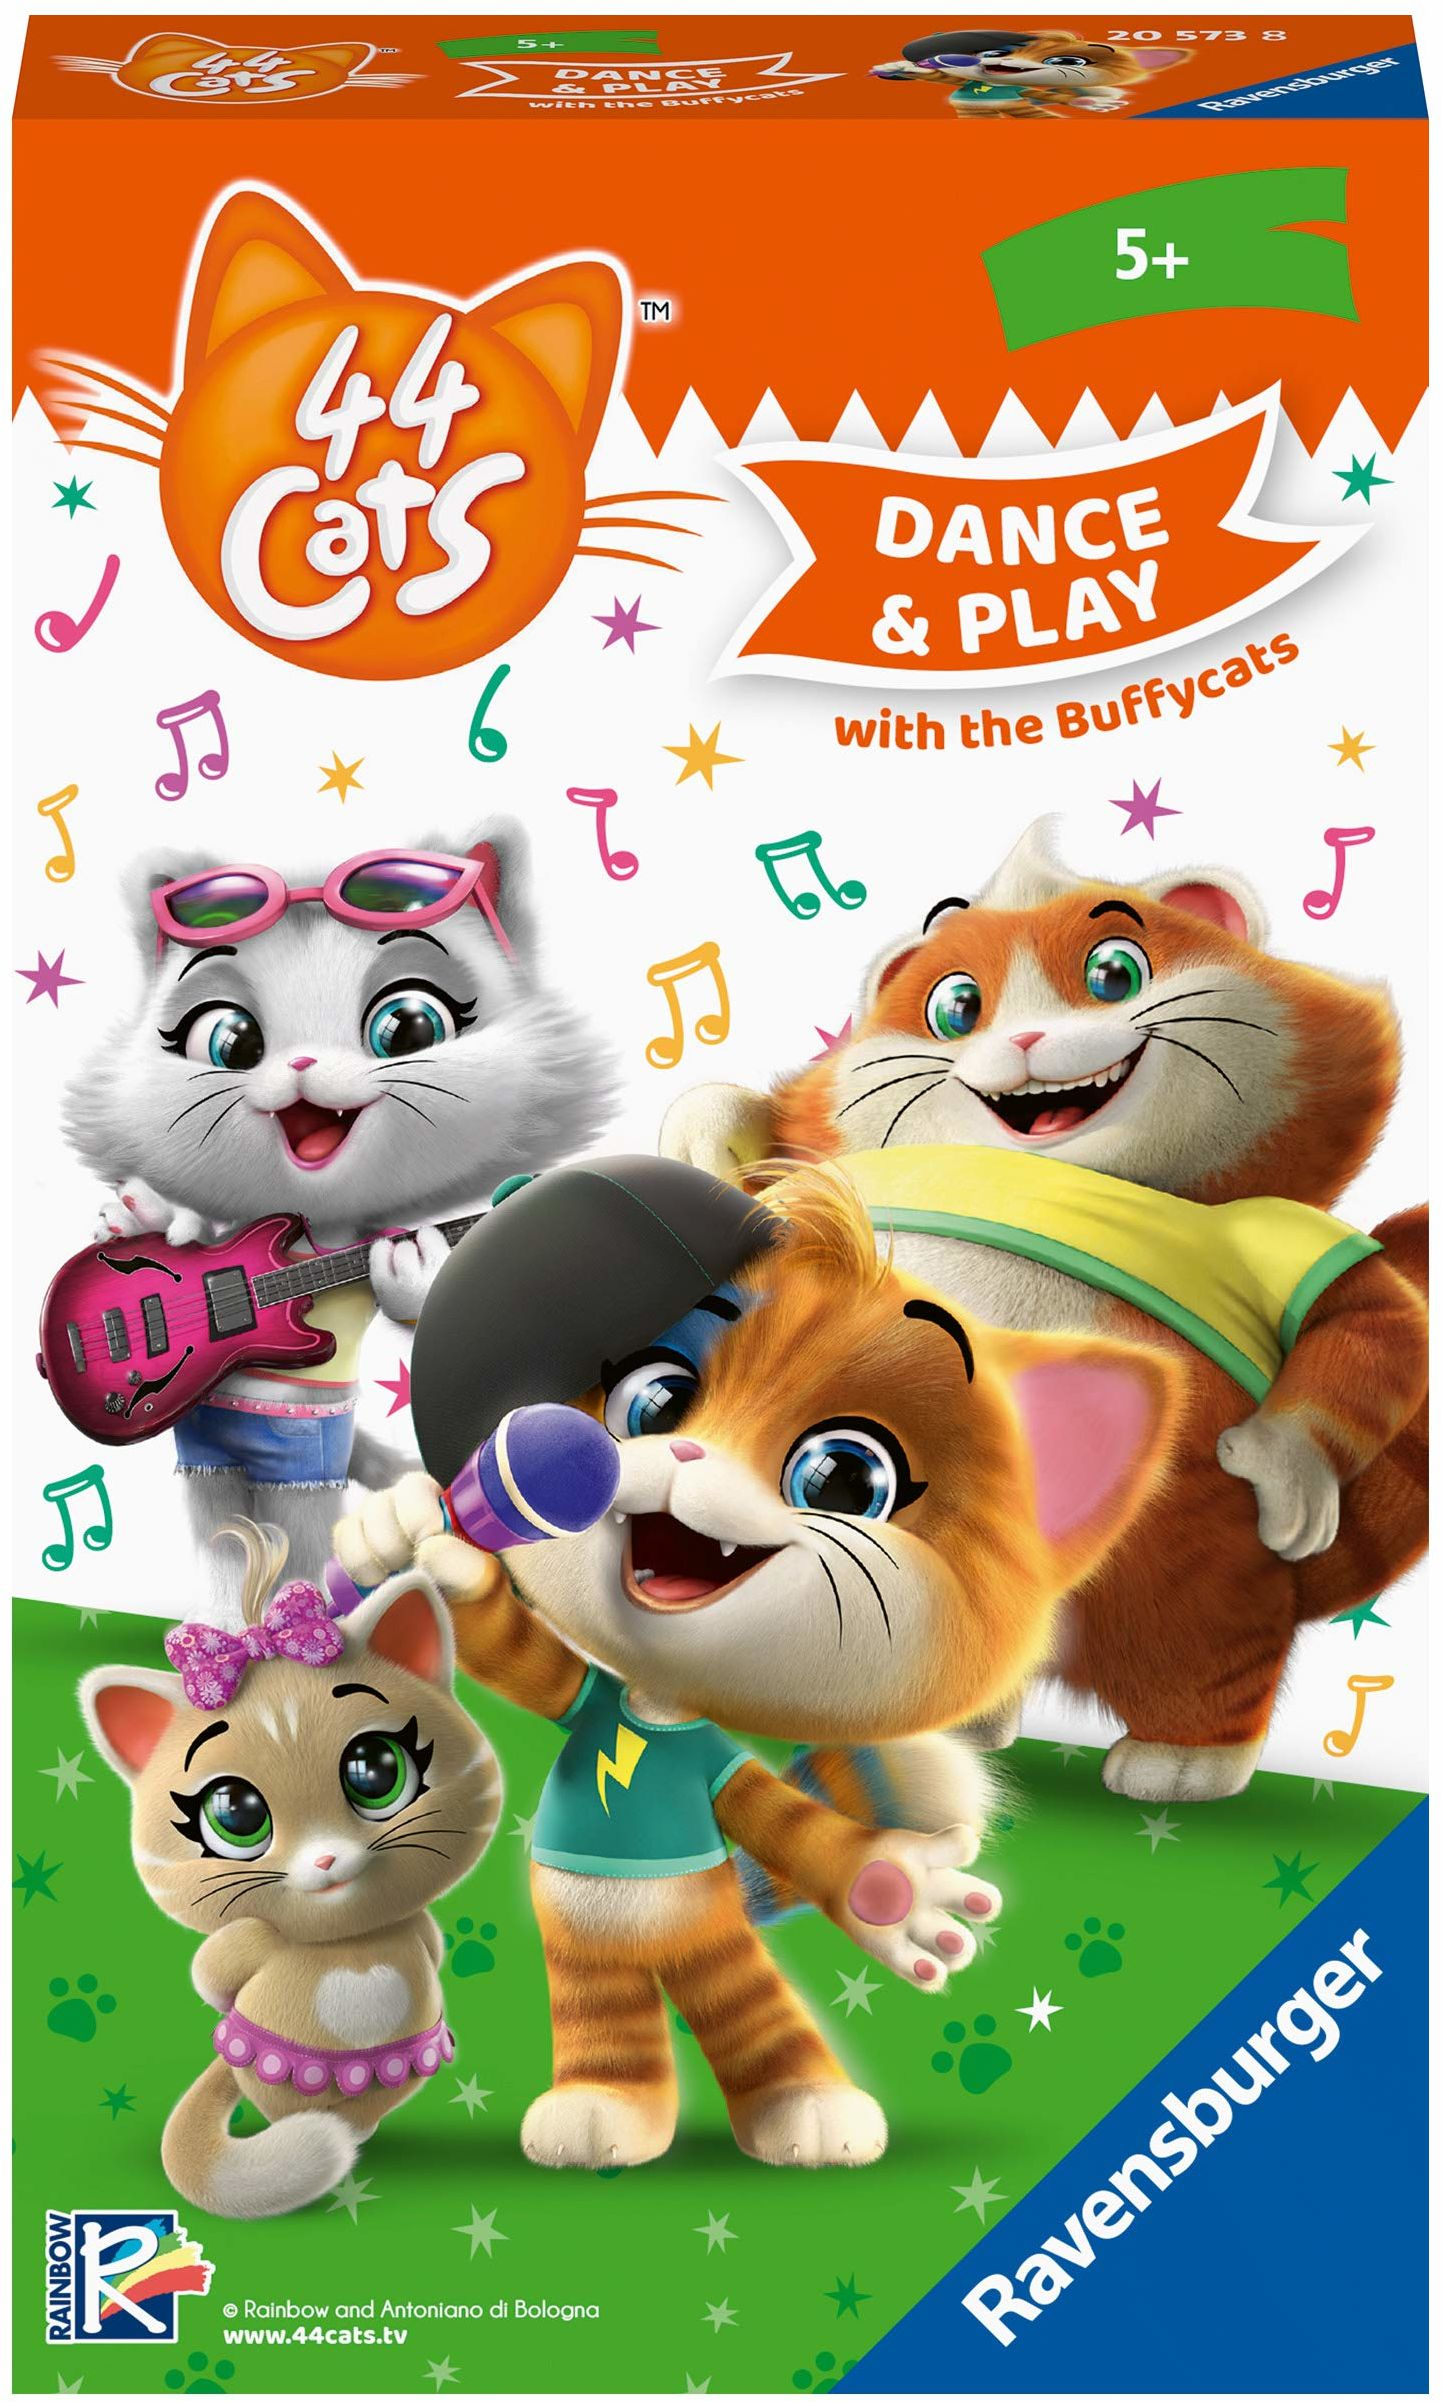 Ravensburger Gry z akcentami 20573 - 44 Cats: Sing and Dance with the Buffycats  gra poszukiwań i ruchu dla fanów od 5 lat